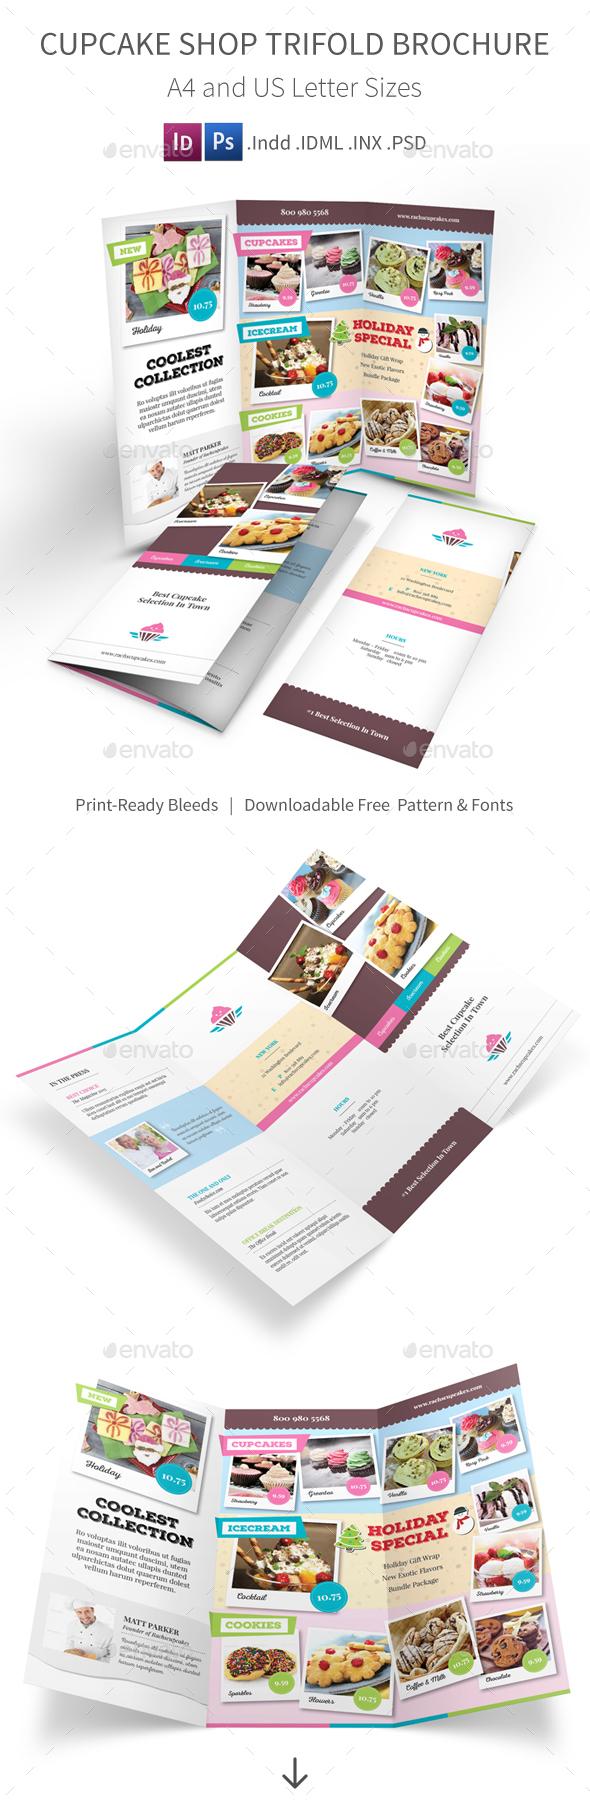 Cupcake Shop Trifold Brochure - Informational Brochures